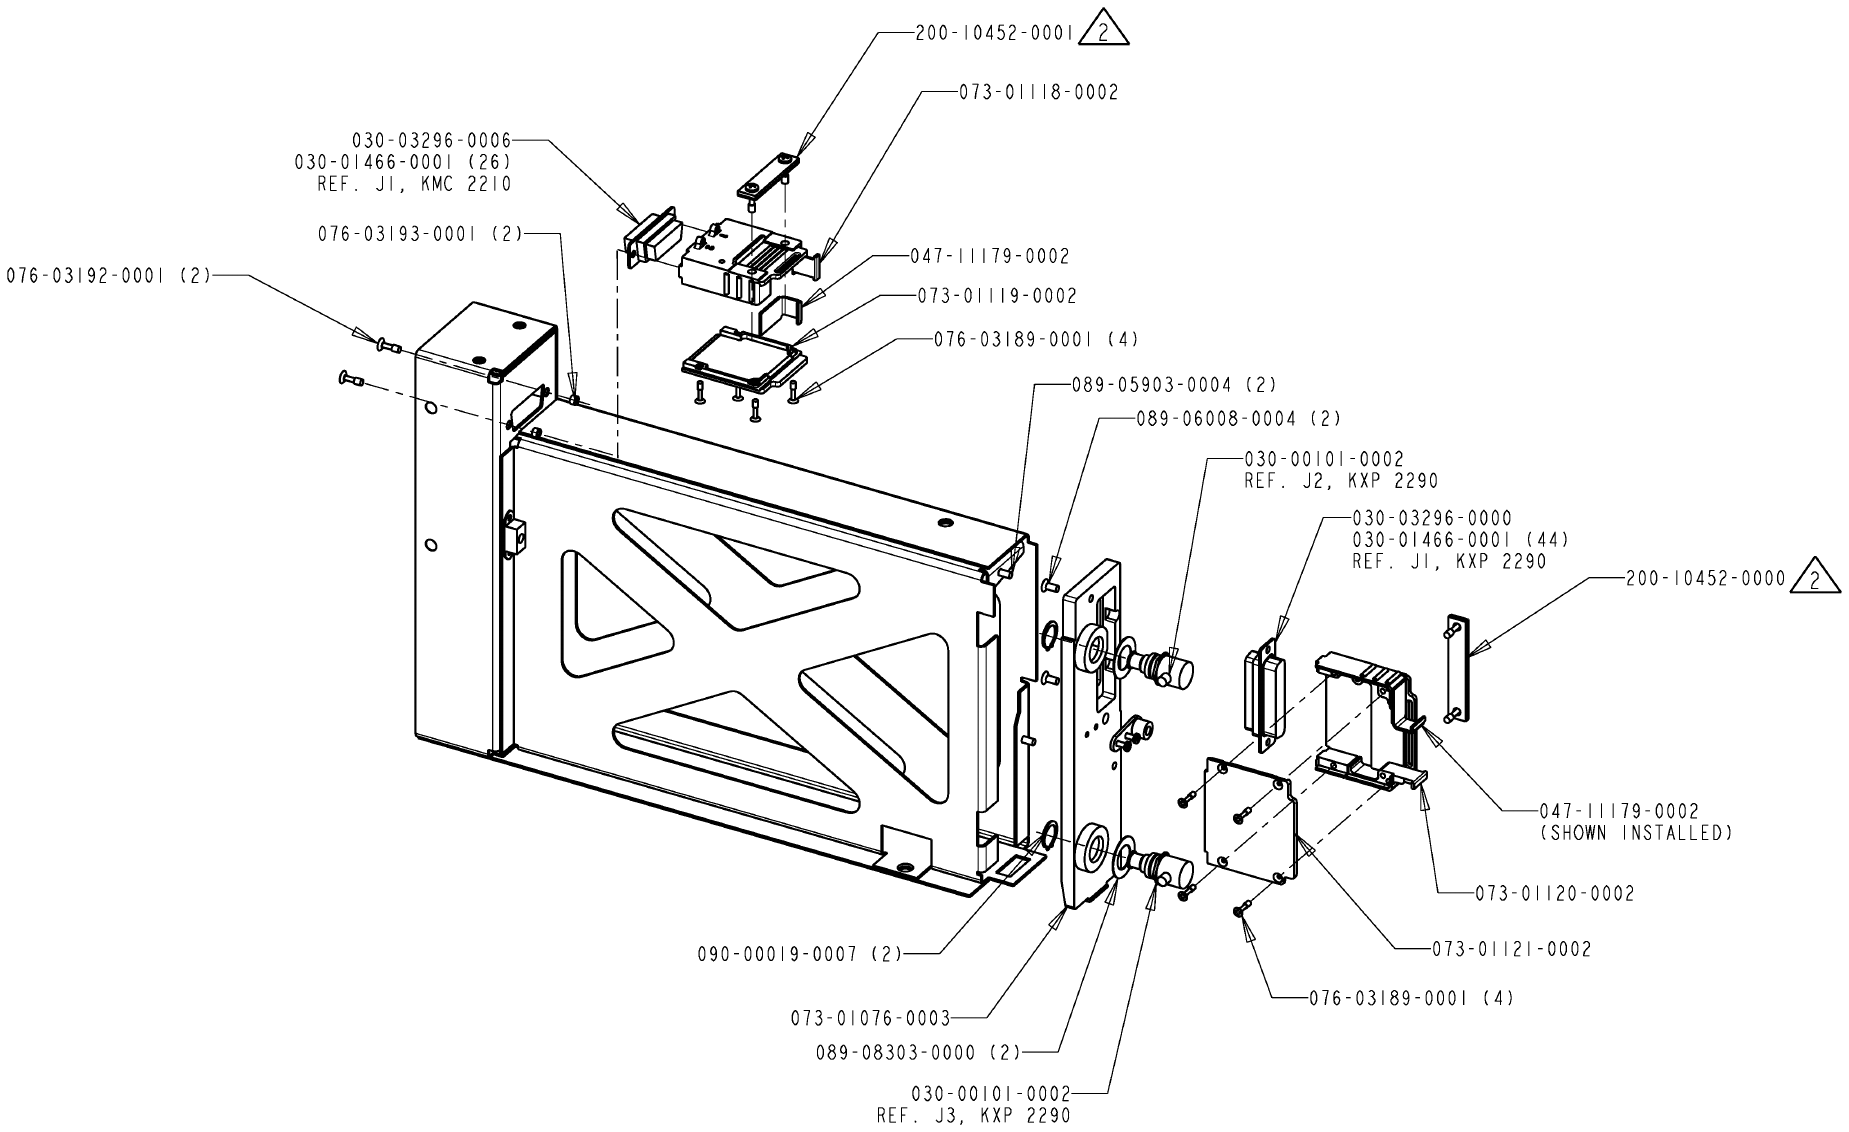 Honeywell KXP2290 AVIATION SERVICES TRANSMITTER User